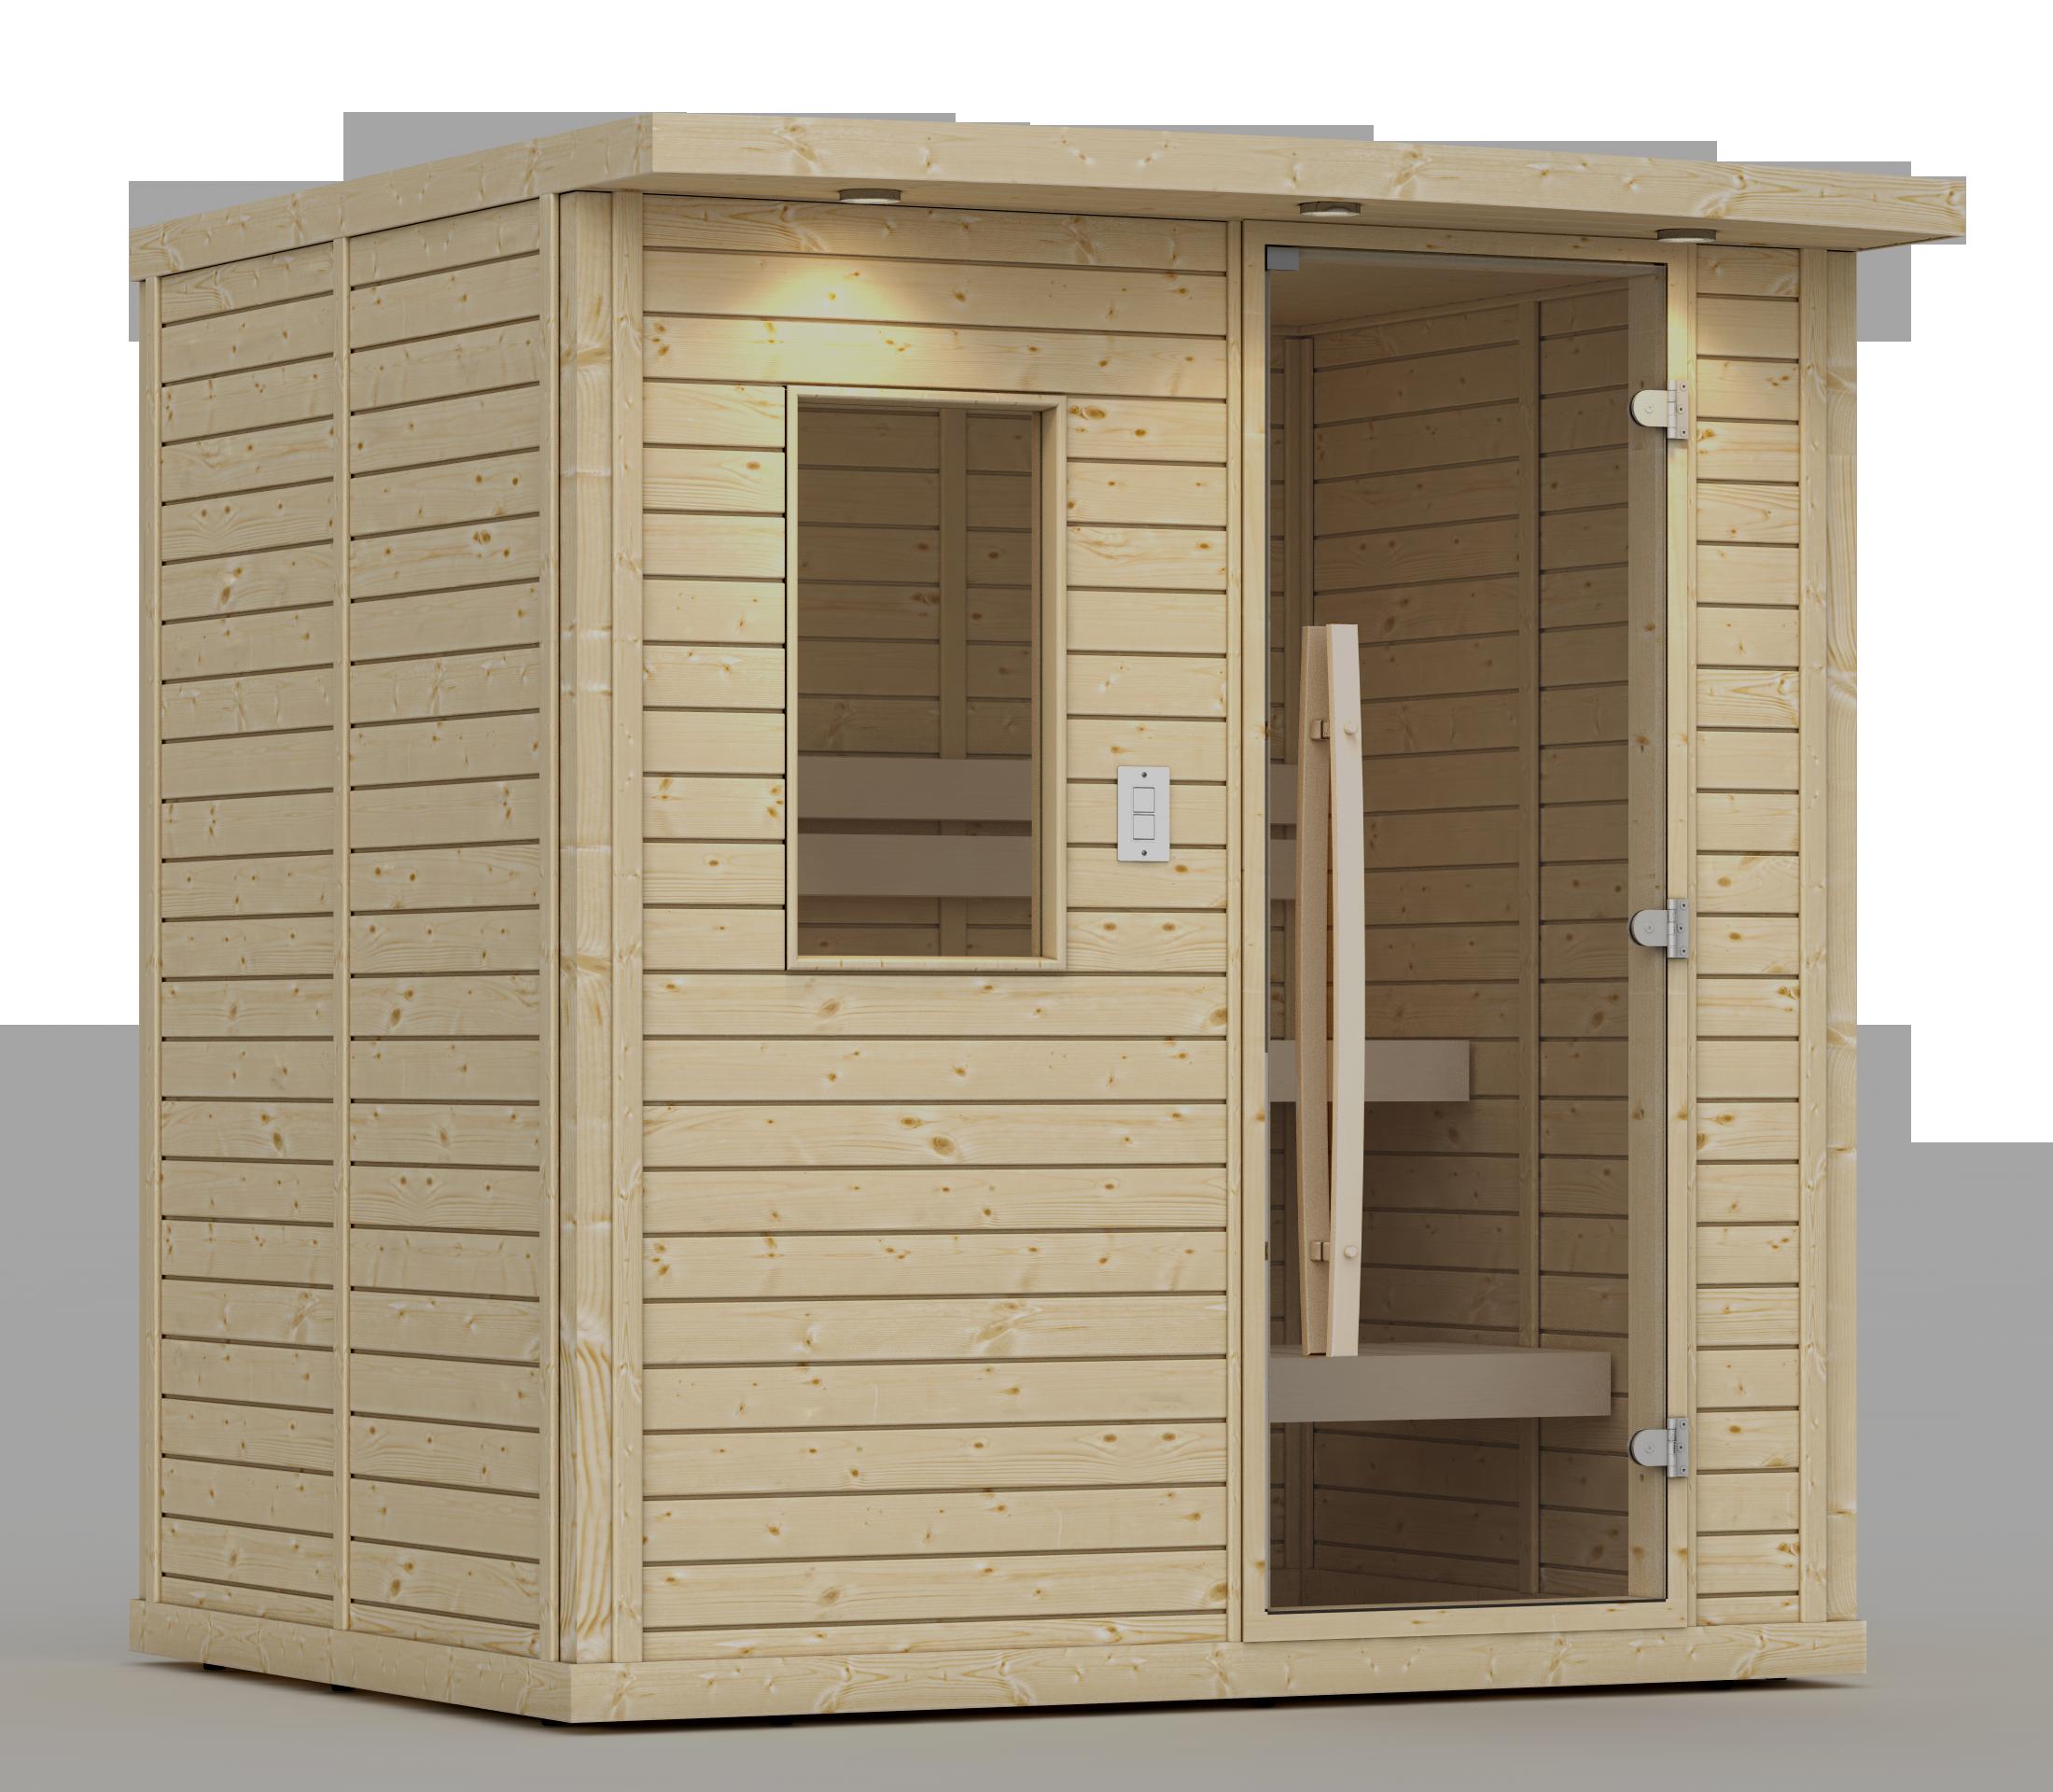 clipart free stock Stones picture . Transparent stone sauna